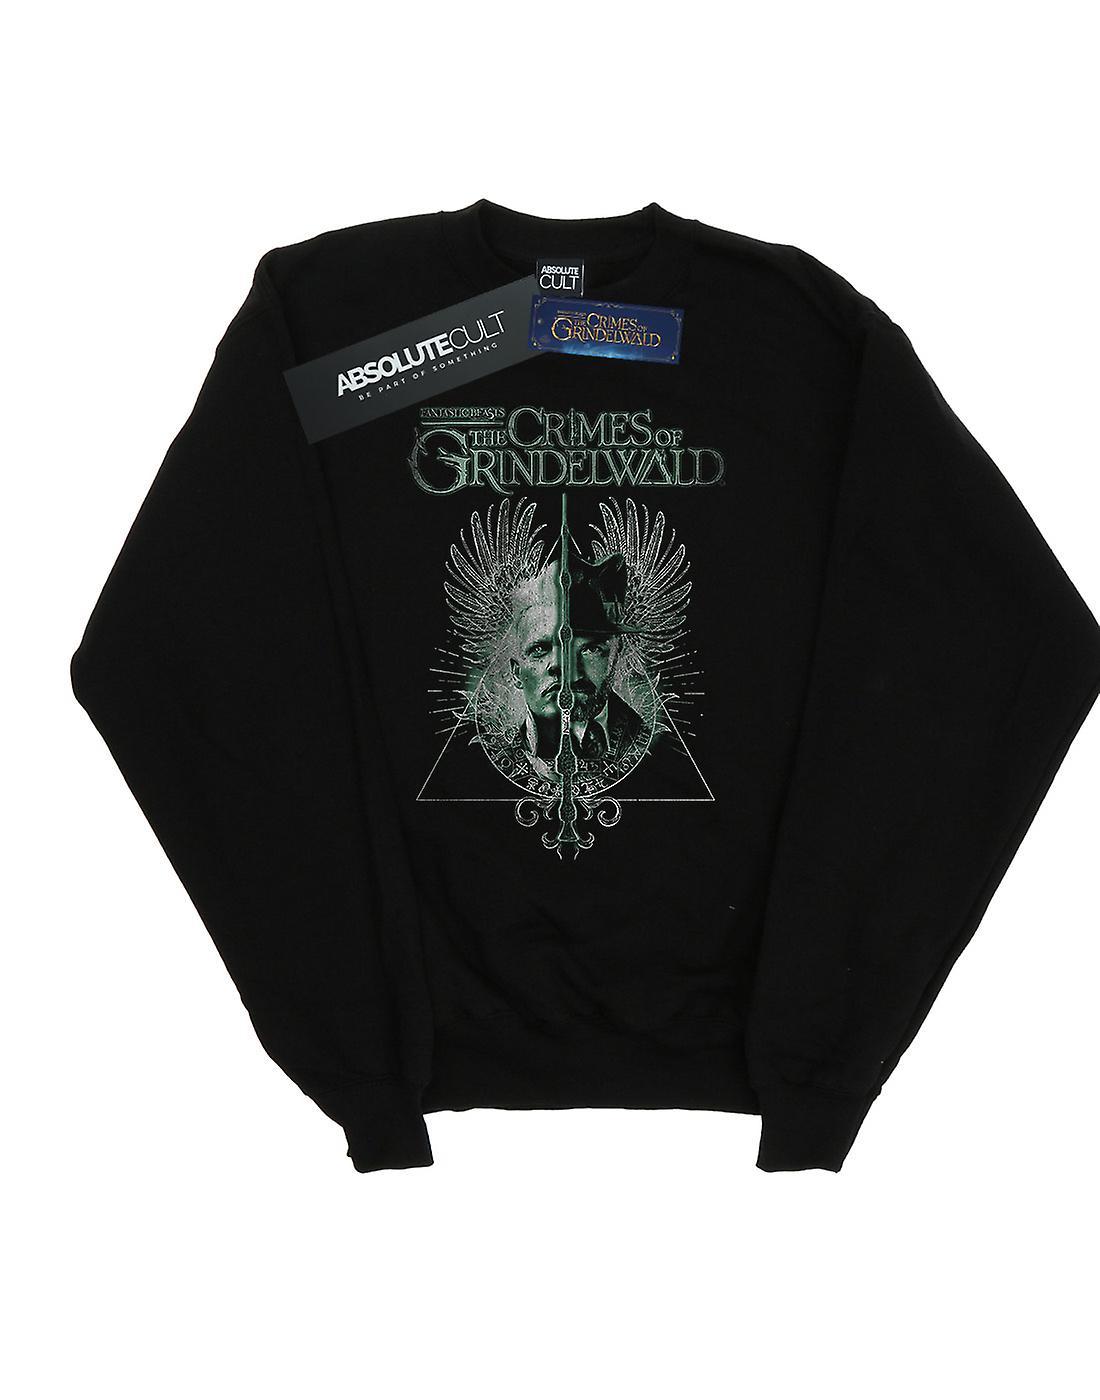 Fantastic Beasts Boys The Crimes Of Grindelwald Wand Split Sweatshirt